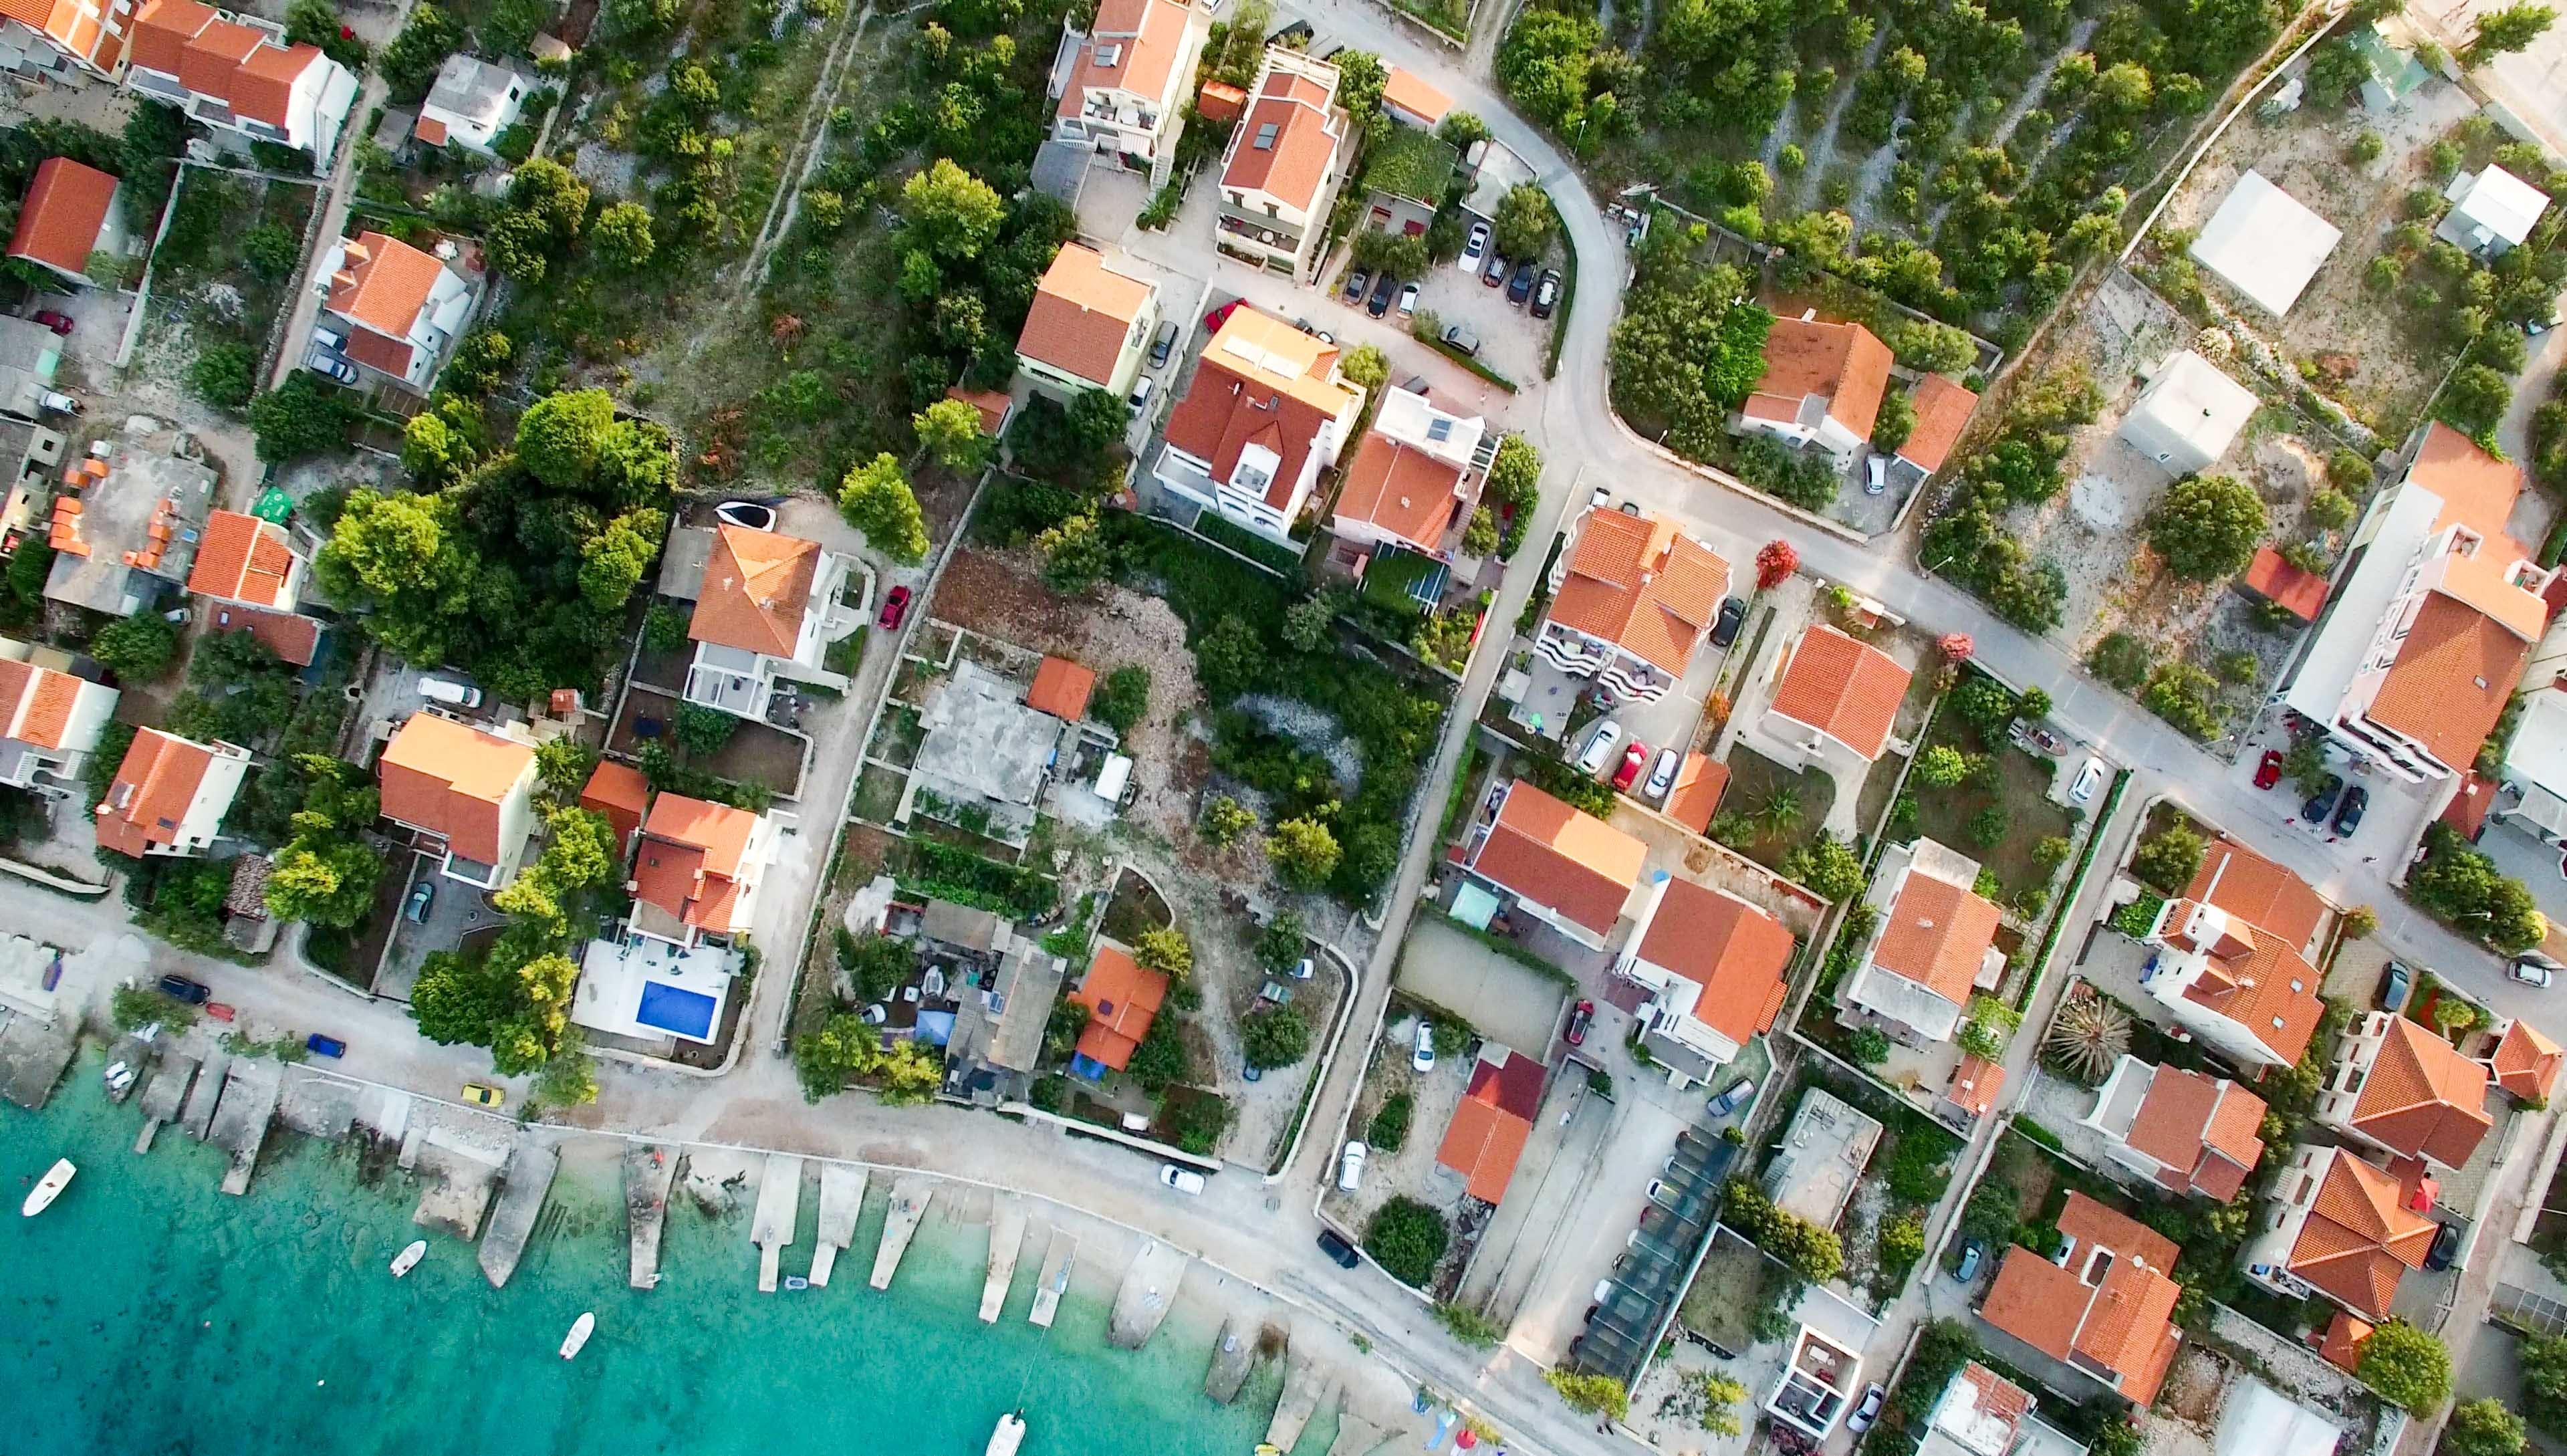 aerial-architecture-buildings-286744